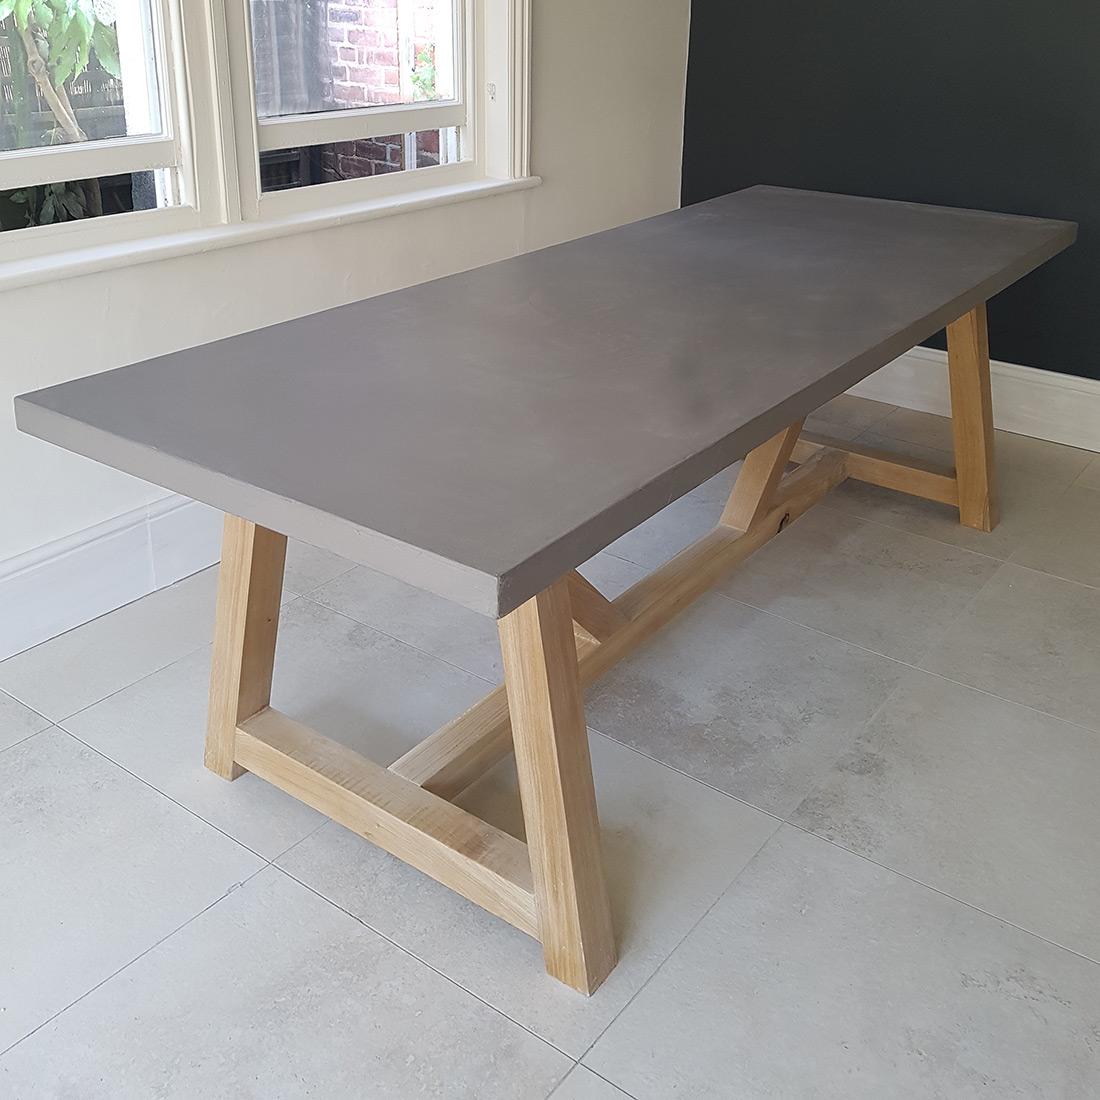 Patio Furniture Repair Santa Ana Ca: Concrete Table Designs